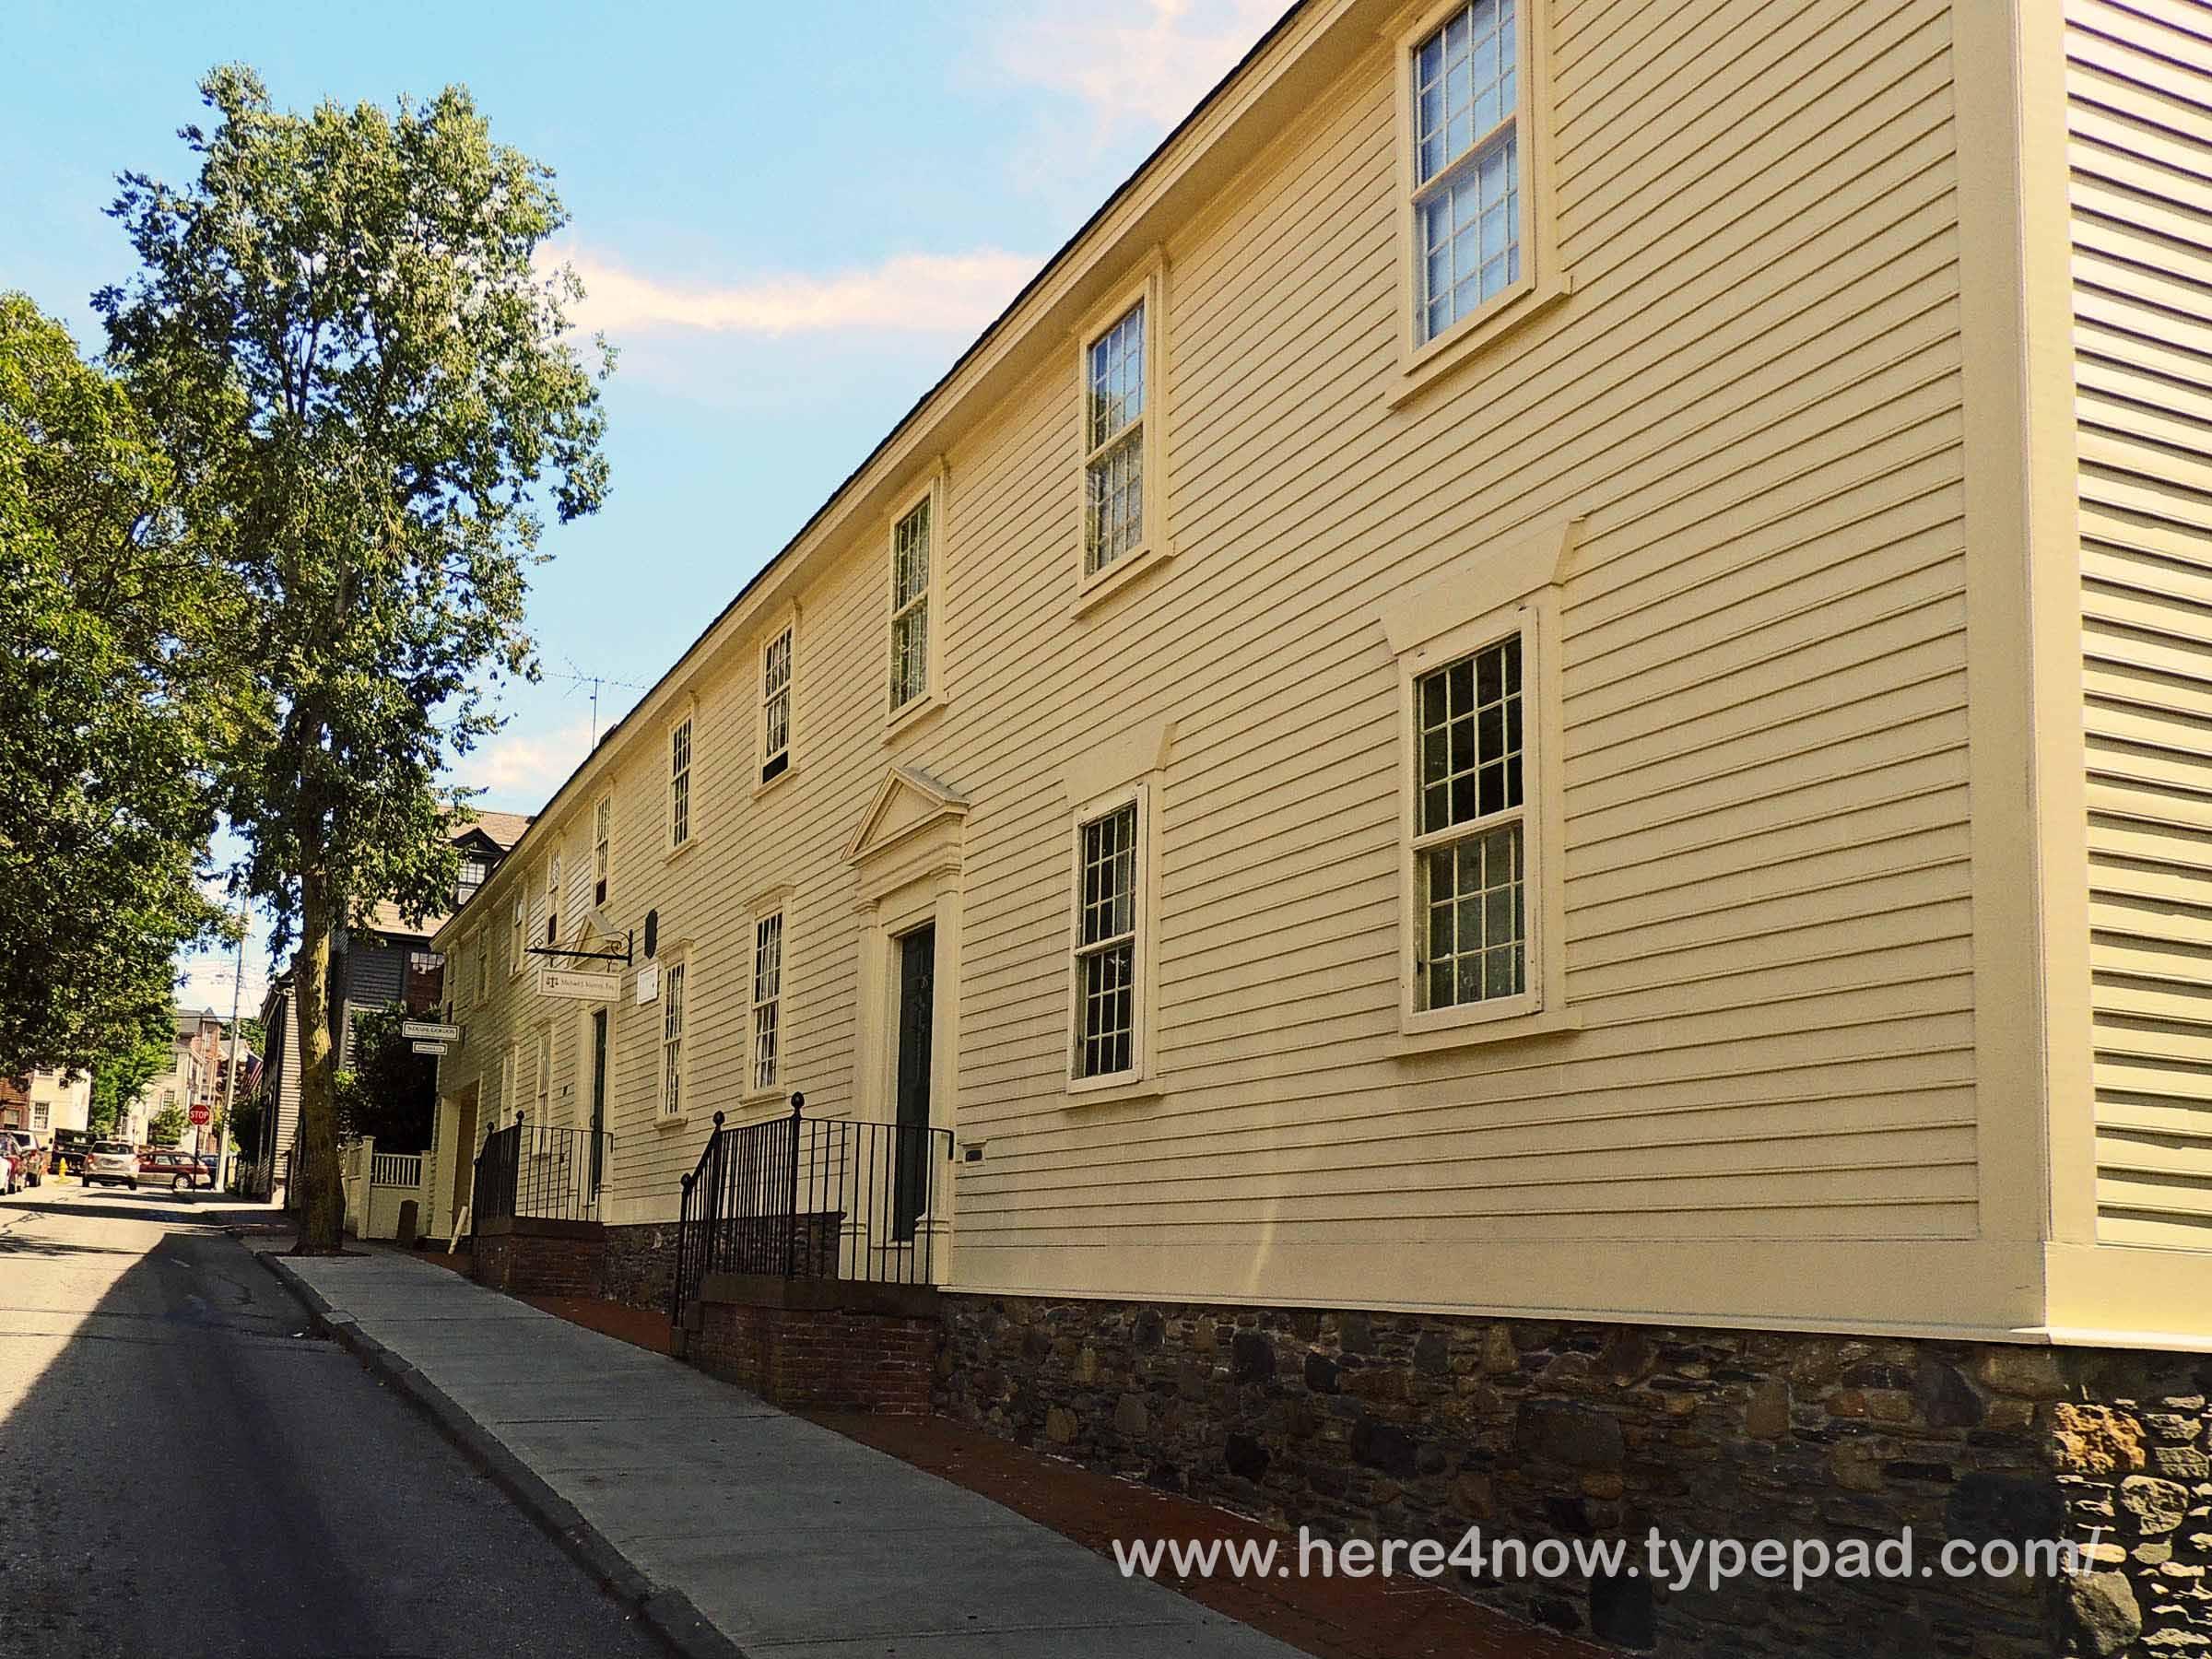 Living Our Dream: Newport, RI